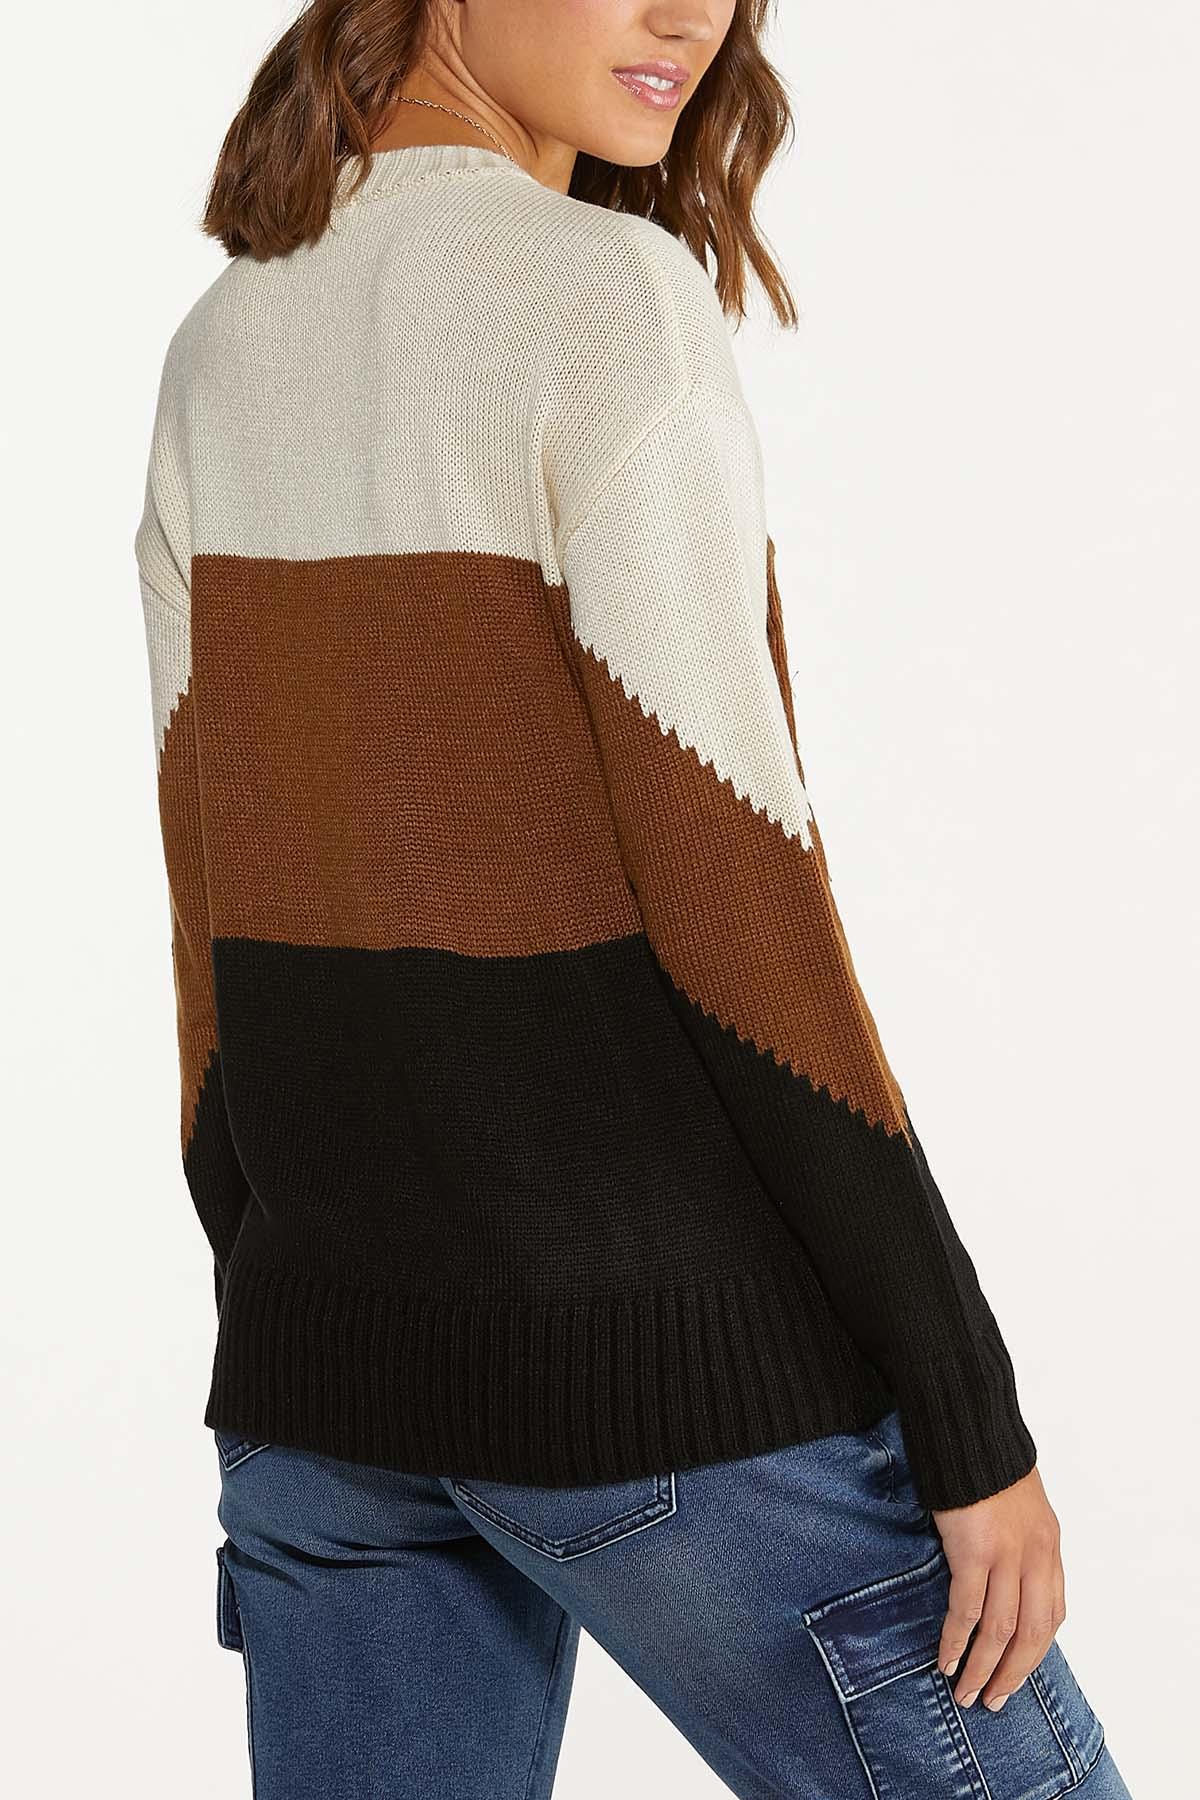 Fringe Colorblock Sweater (Item #44655485)